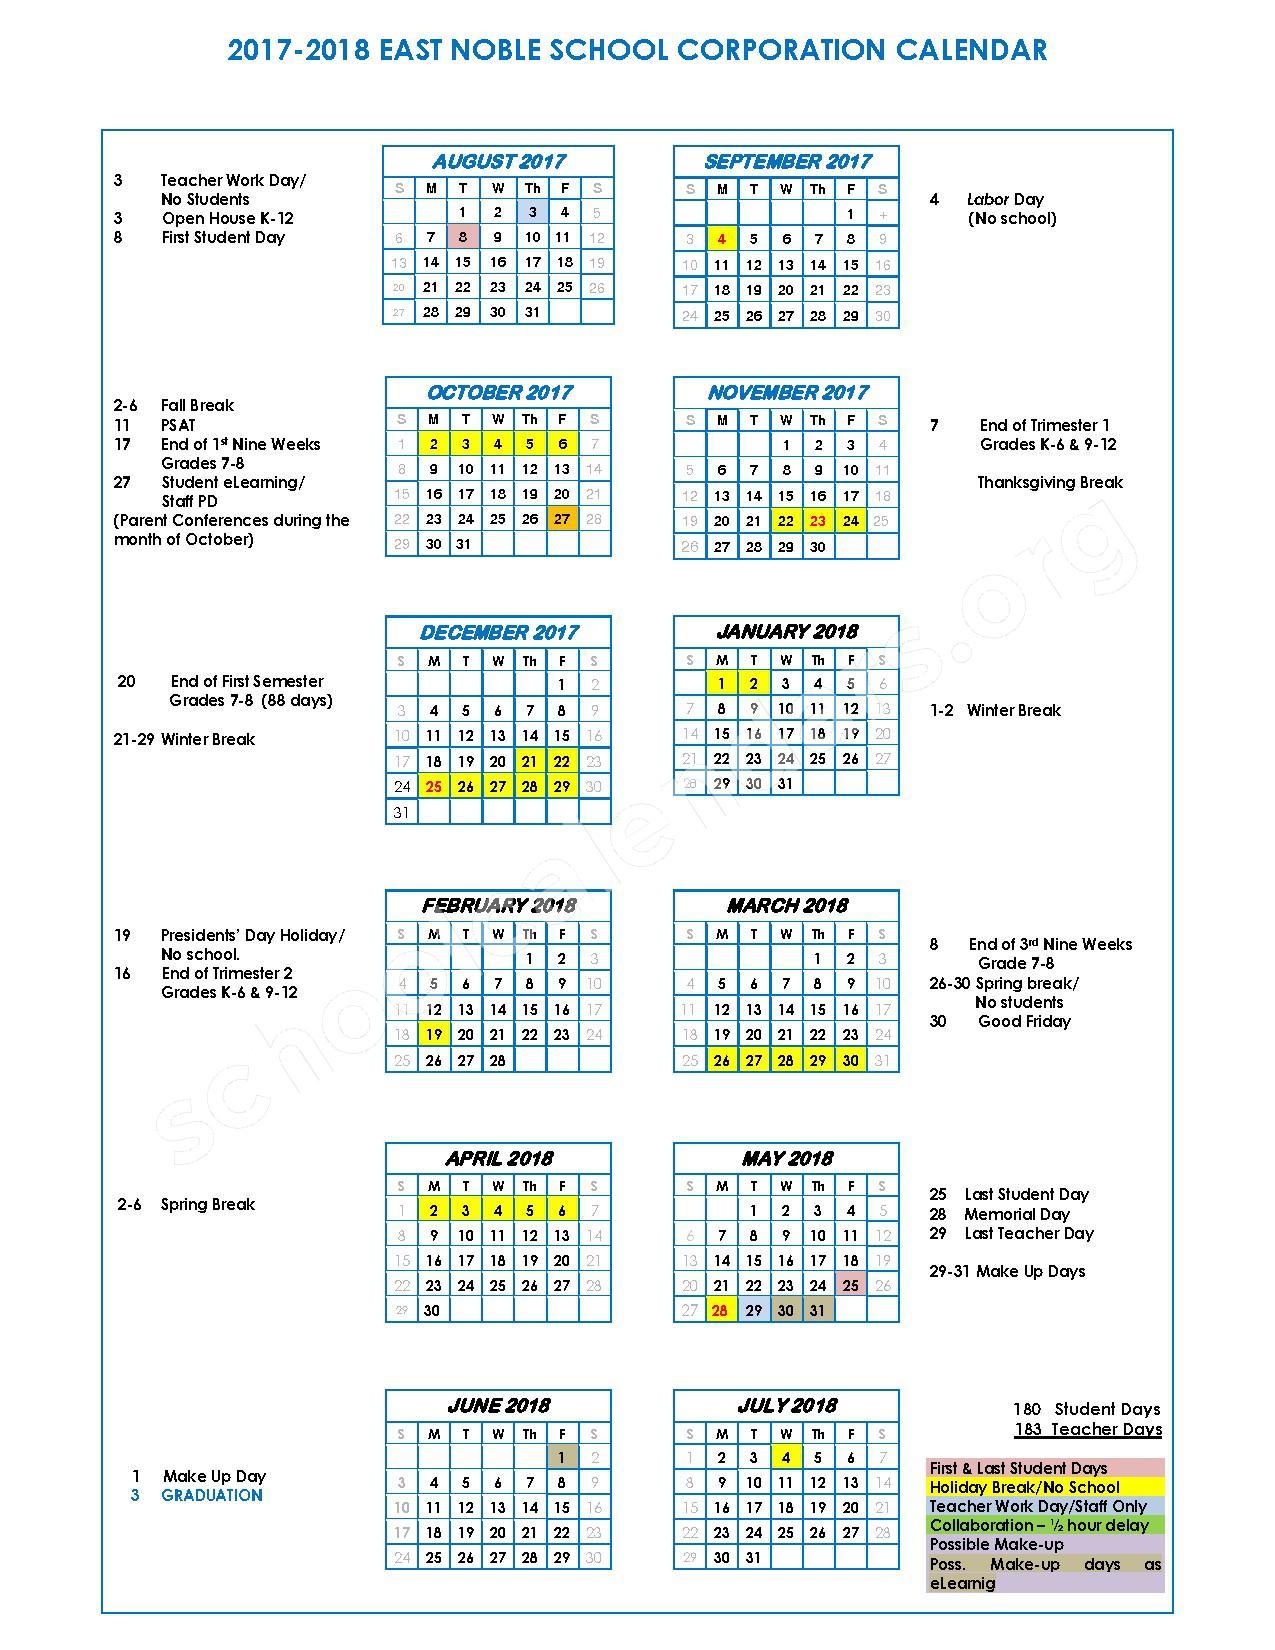 2017 - 2018 School Calendar – East Noble School Corporation – page 1